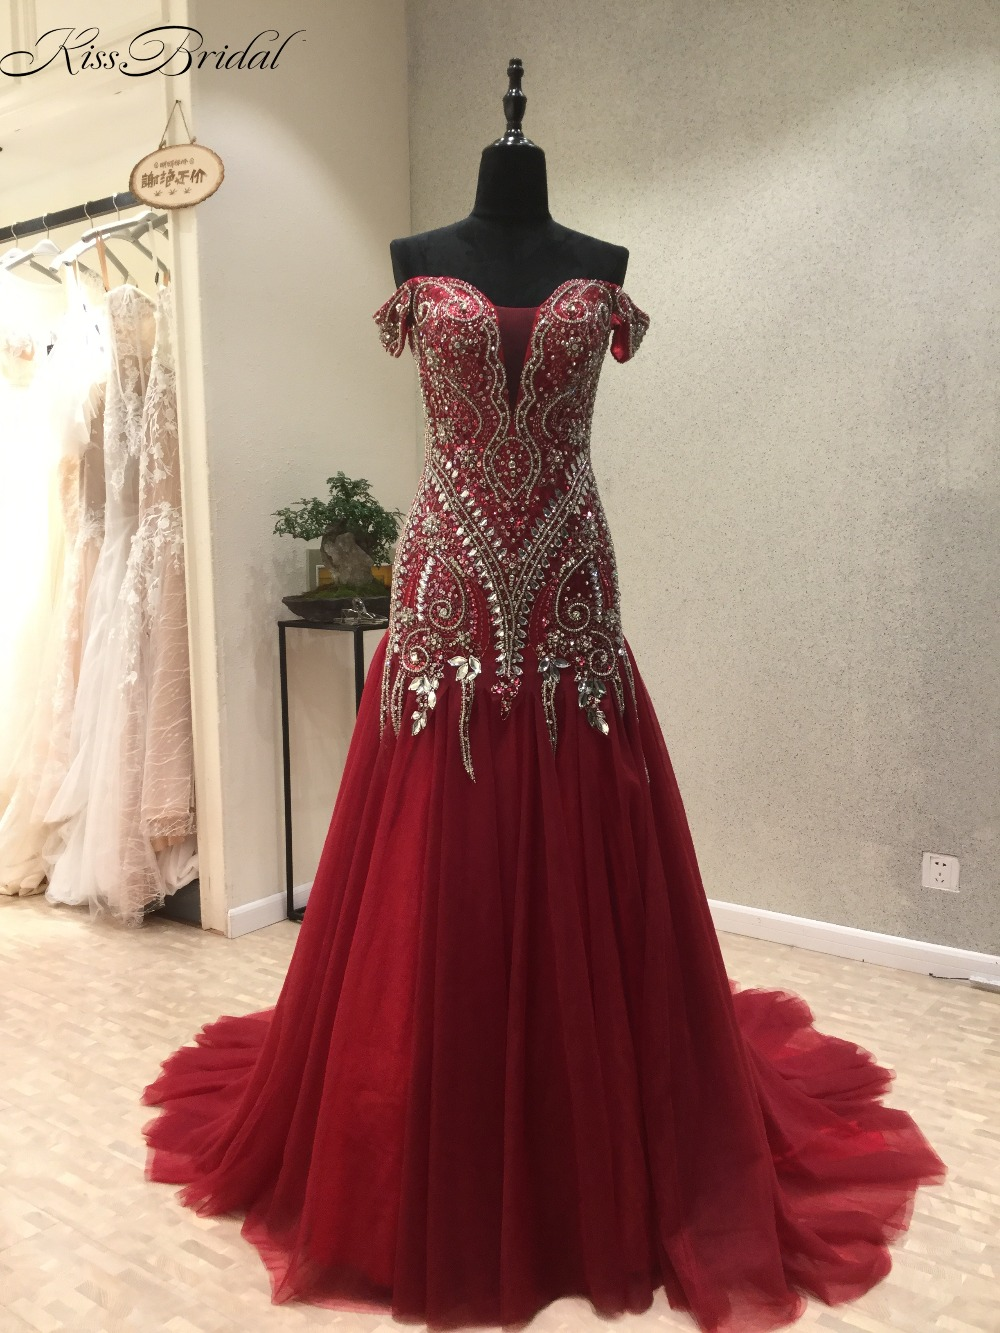 New Elegant Long Evening Dress 2018 Sweetheart Neck Sleeveless Court Train Beading Chiffon A-Line Prom Dresses Vestido de festa